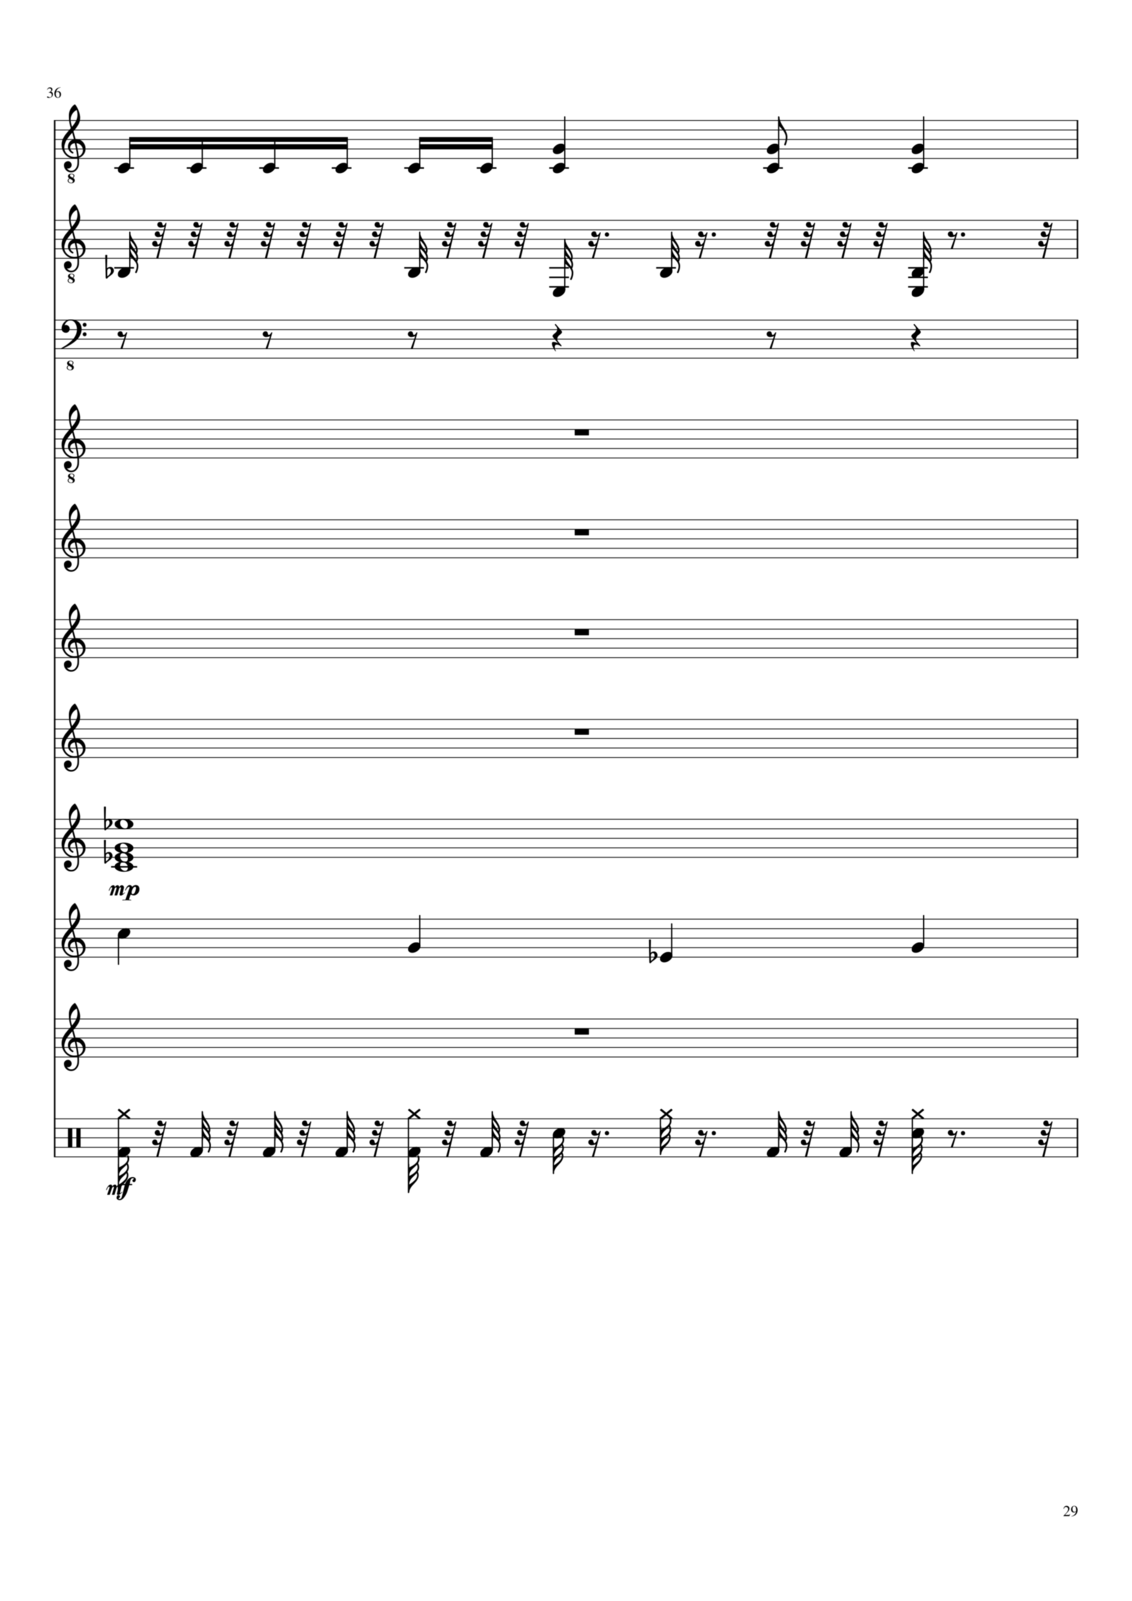 Belyiy sokol slide, Image 29